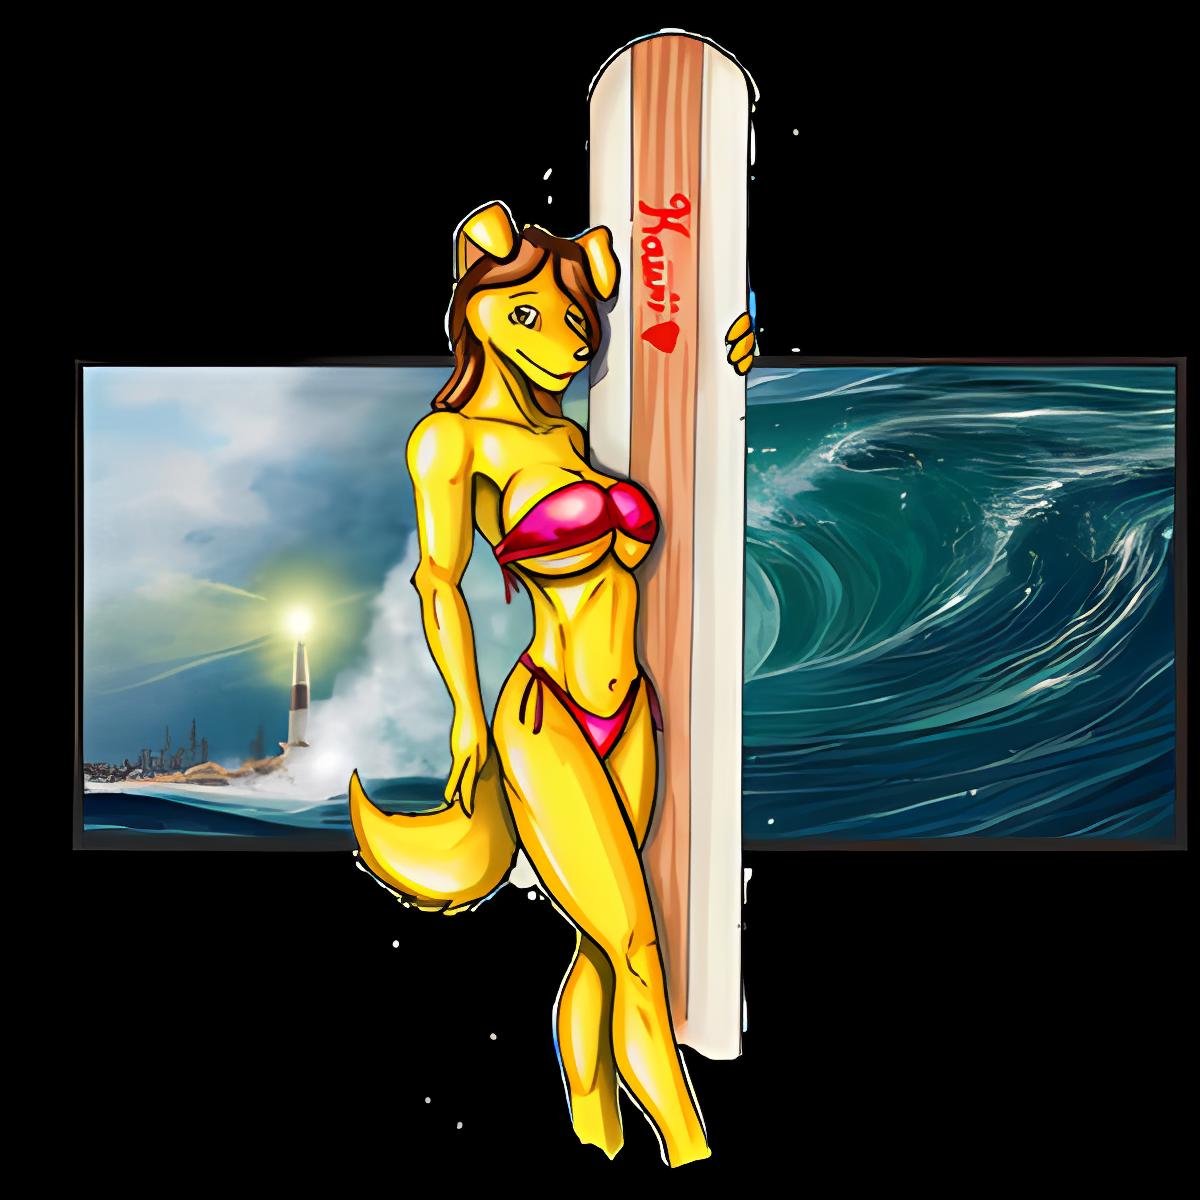 Sexy Tsunami Surfer device-dependant